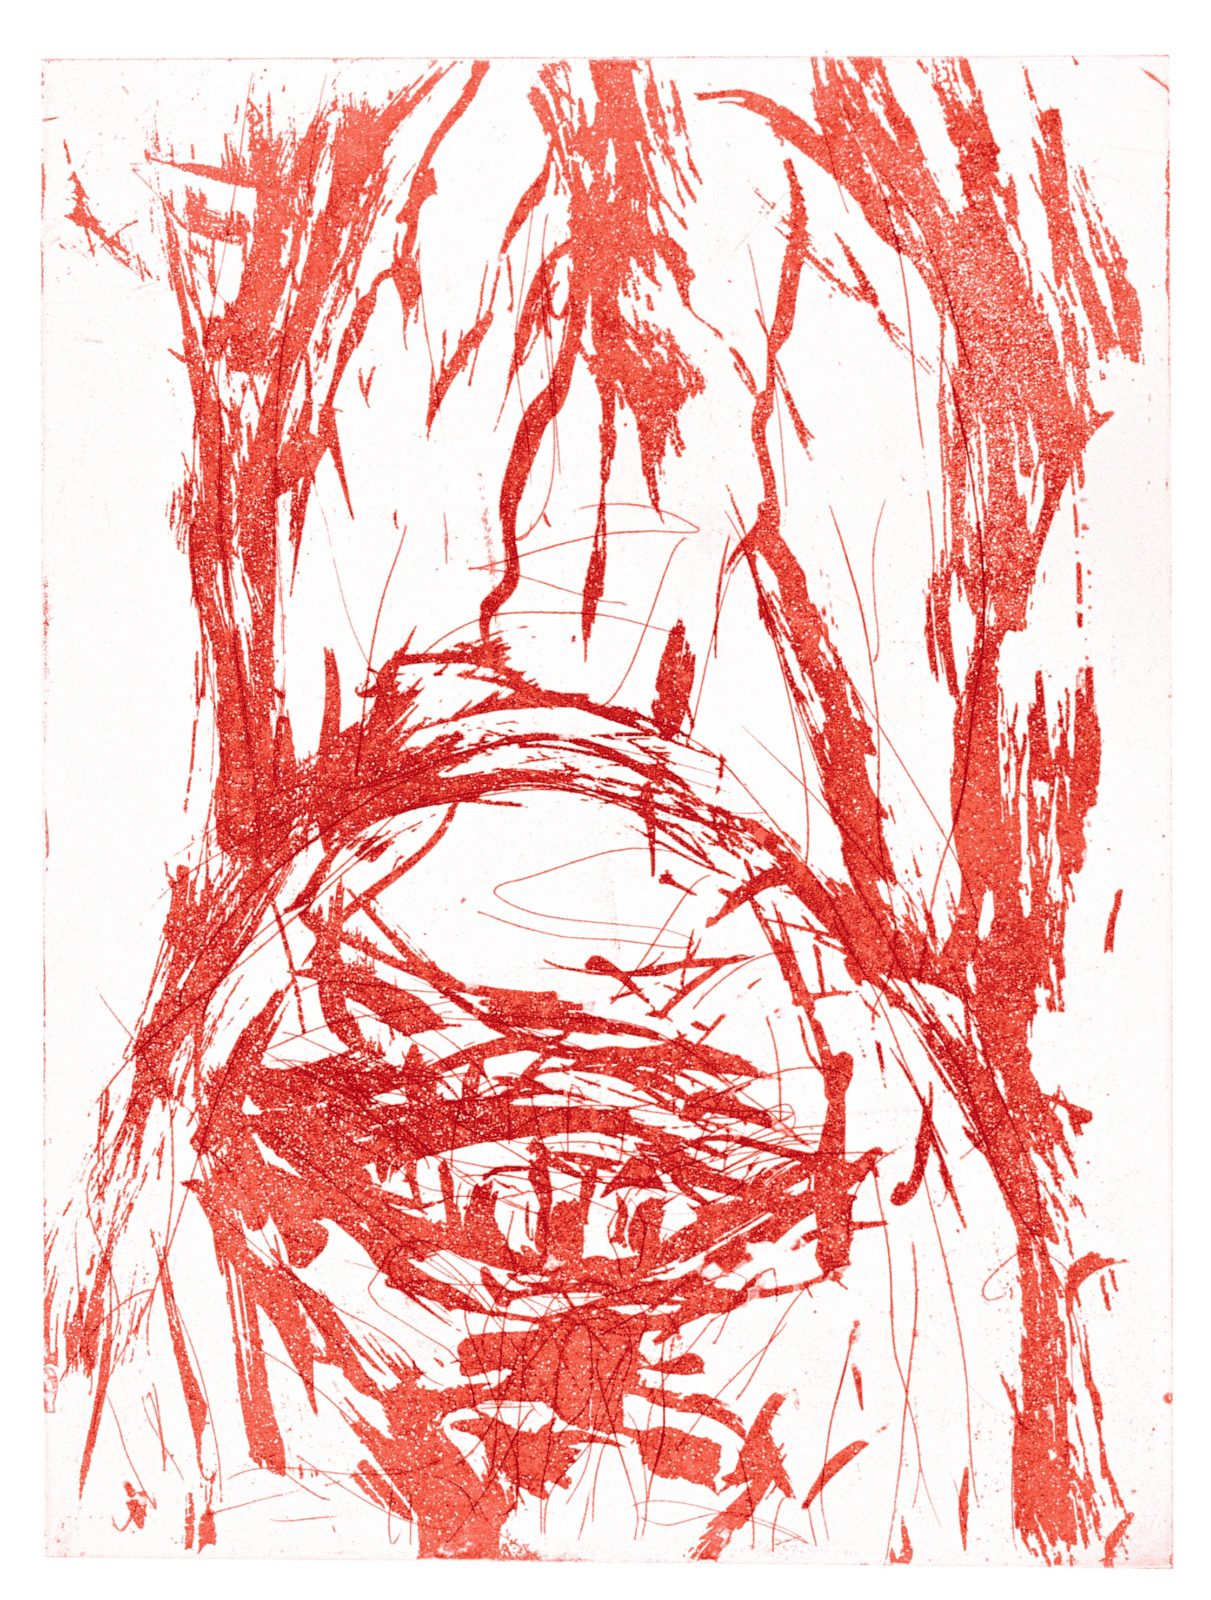 Georg Baselitz | Hals.